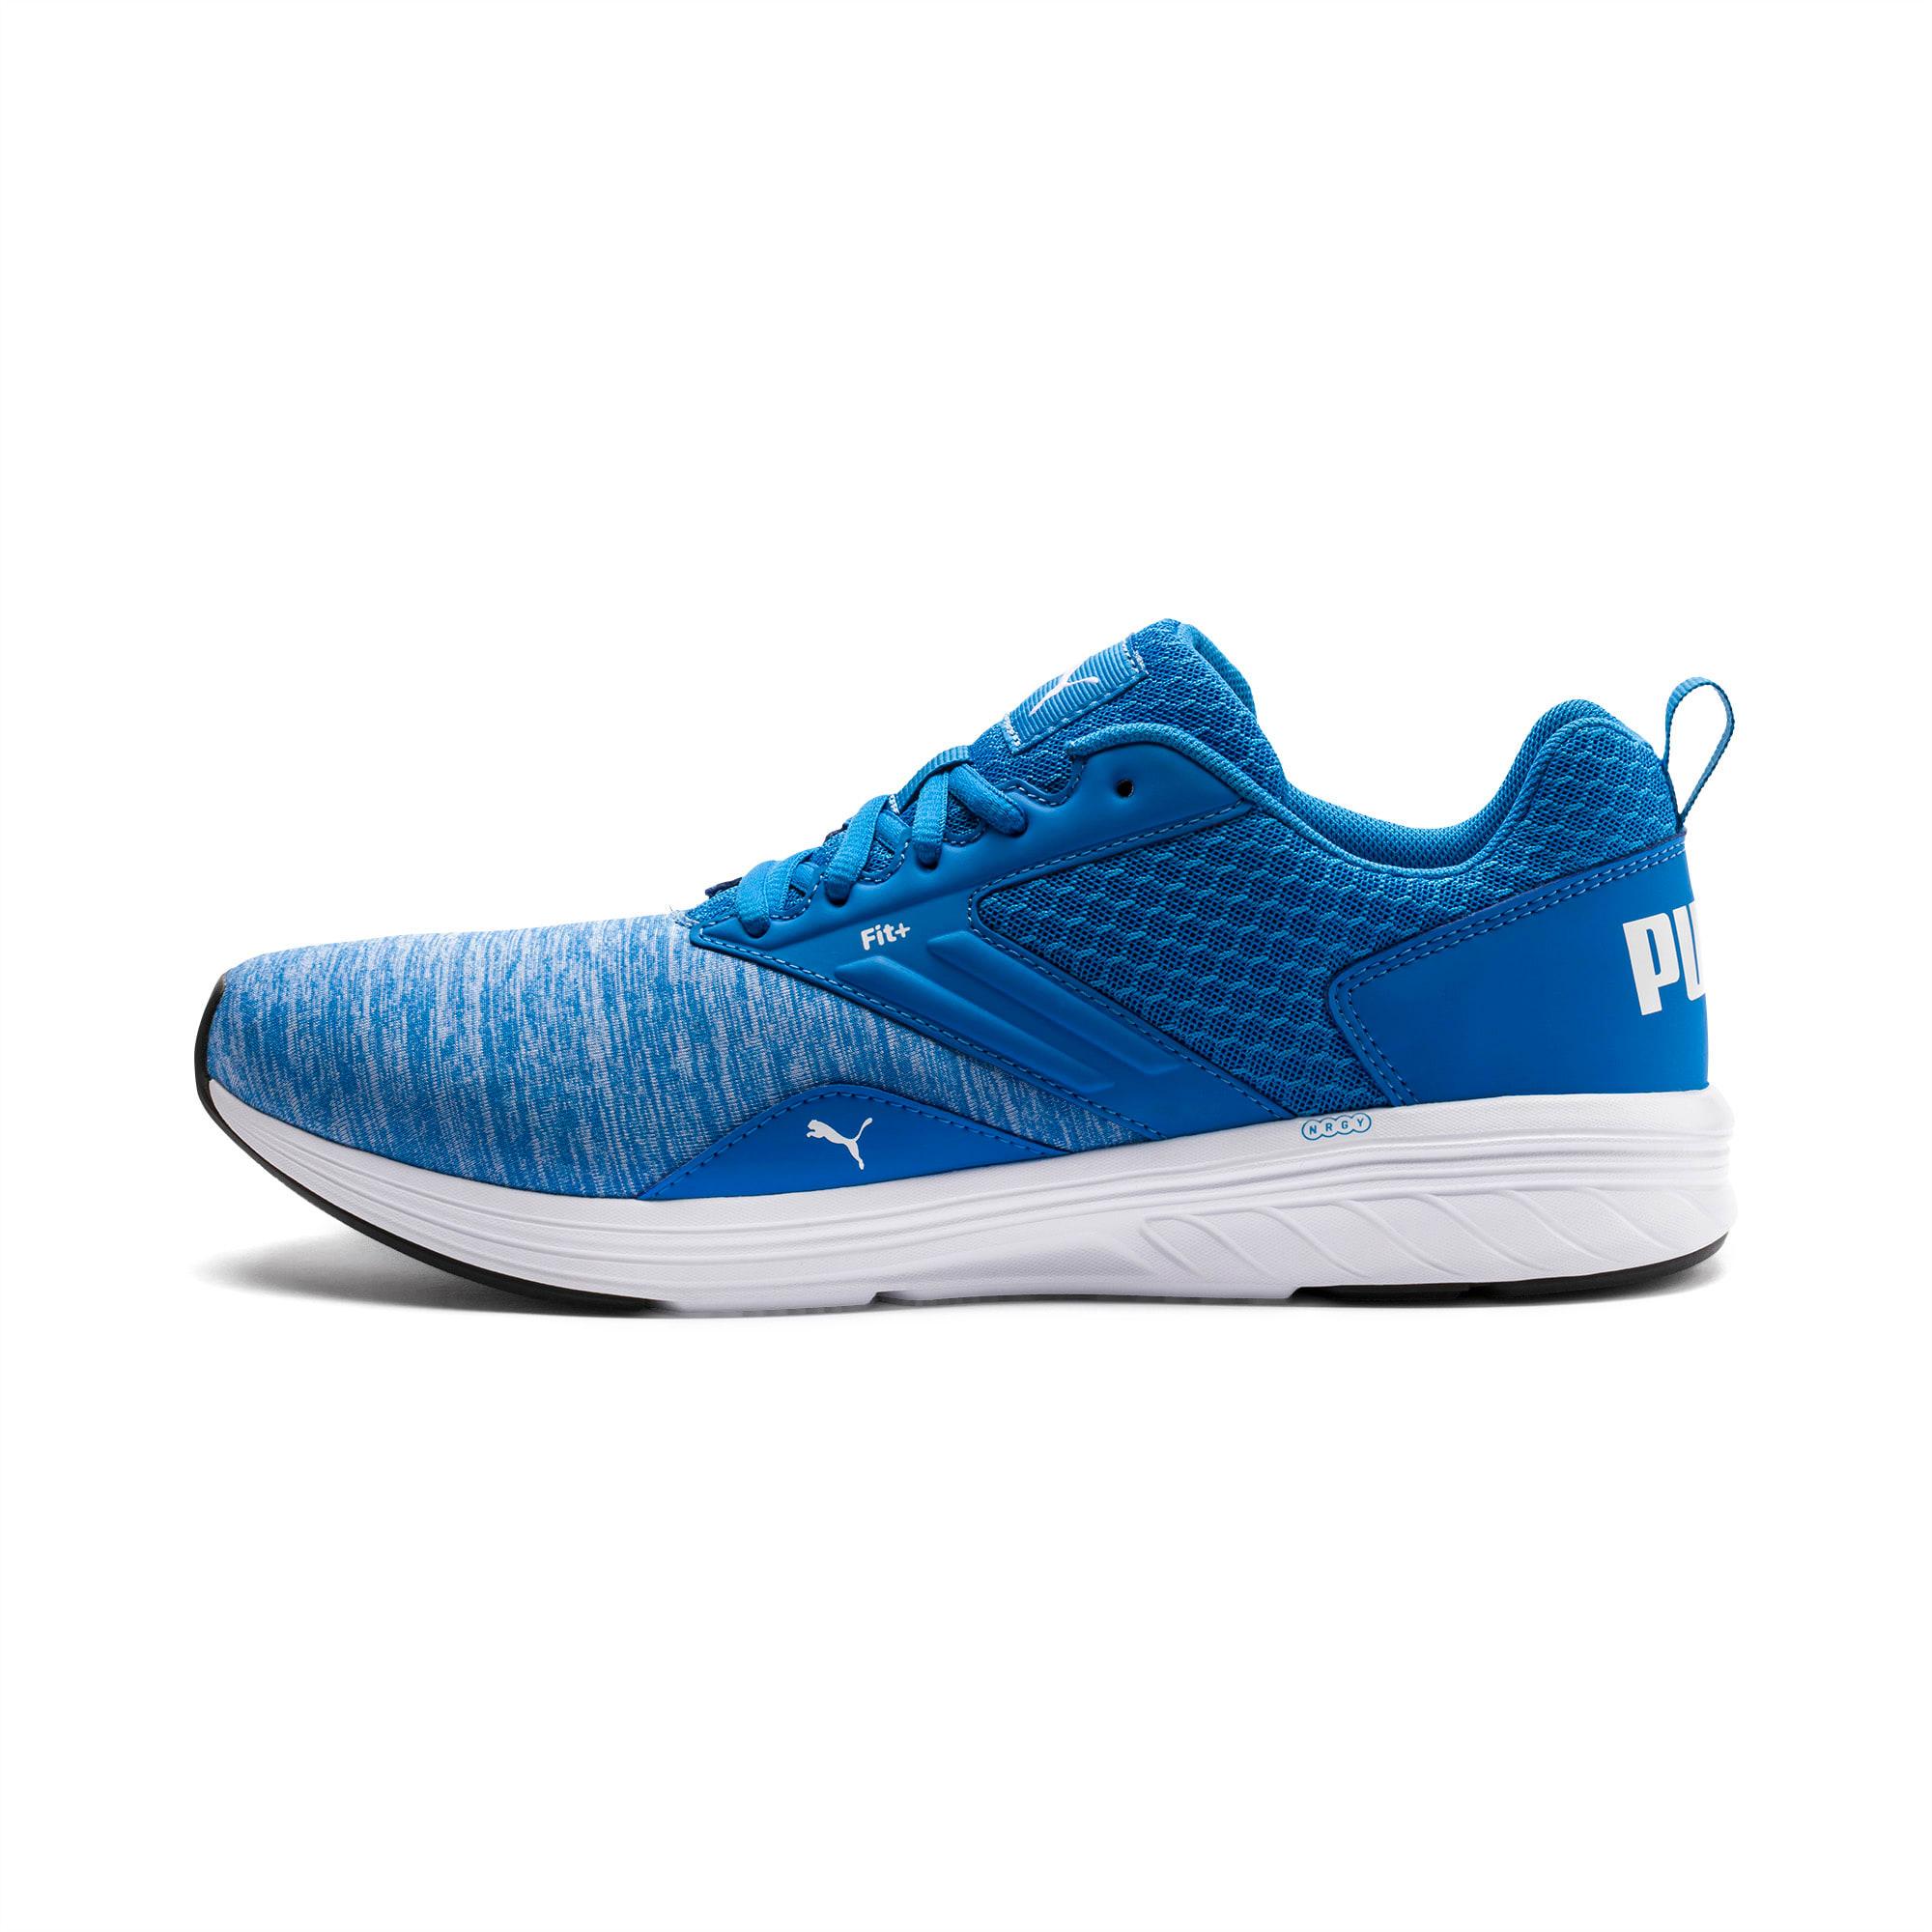 Zapatos de hombre para correr NRGY Comet